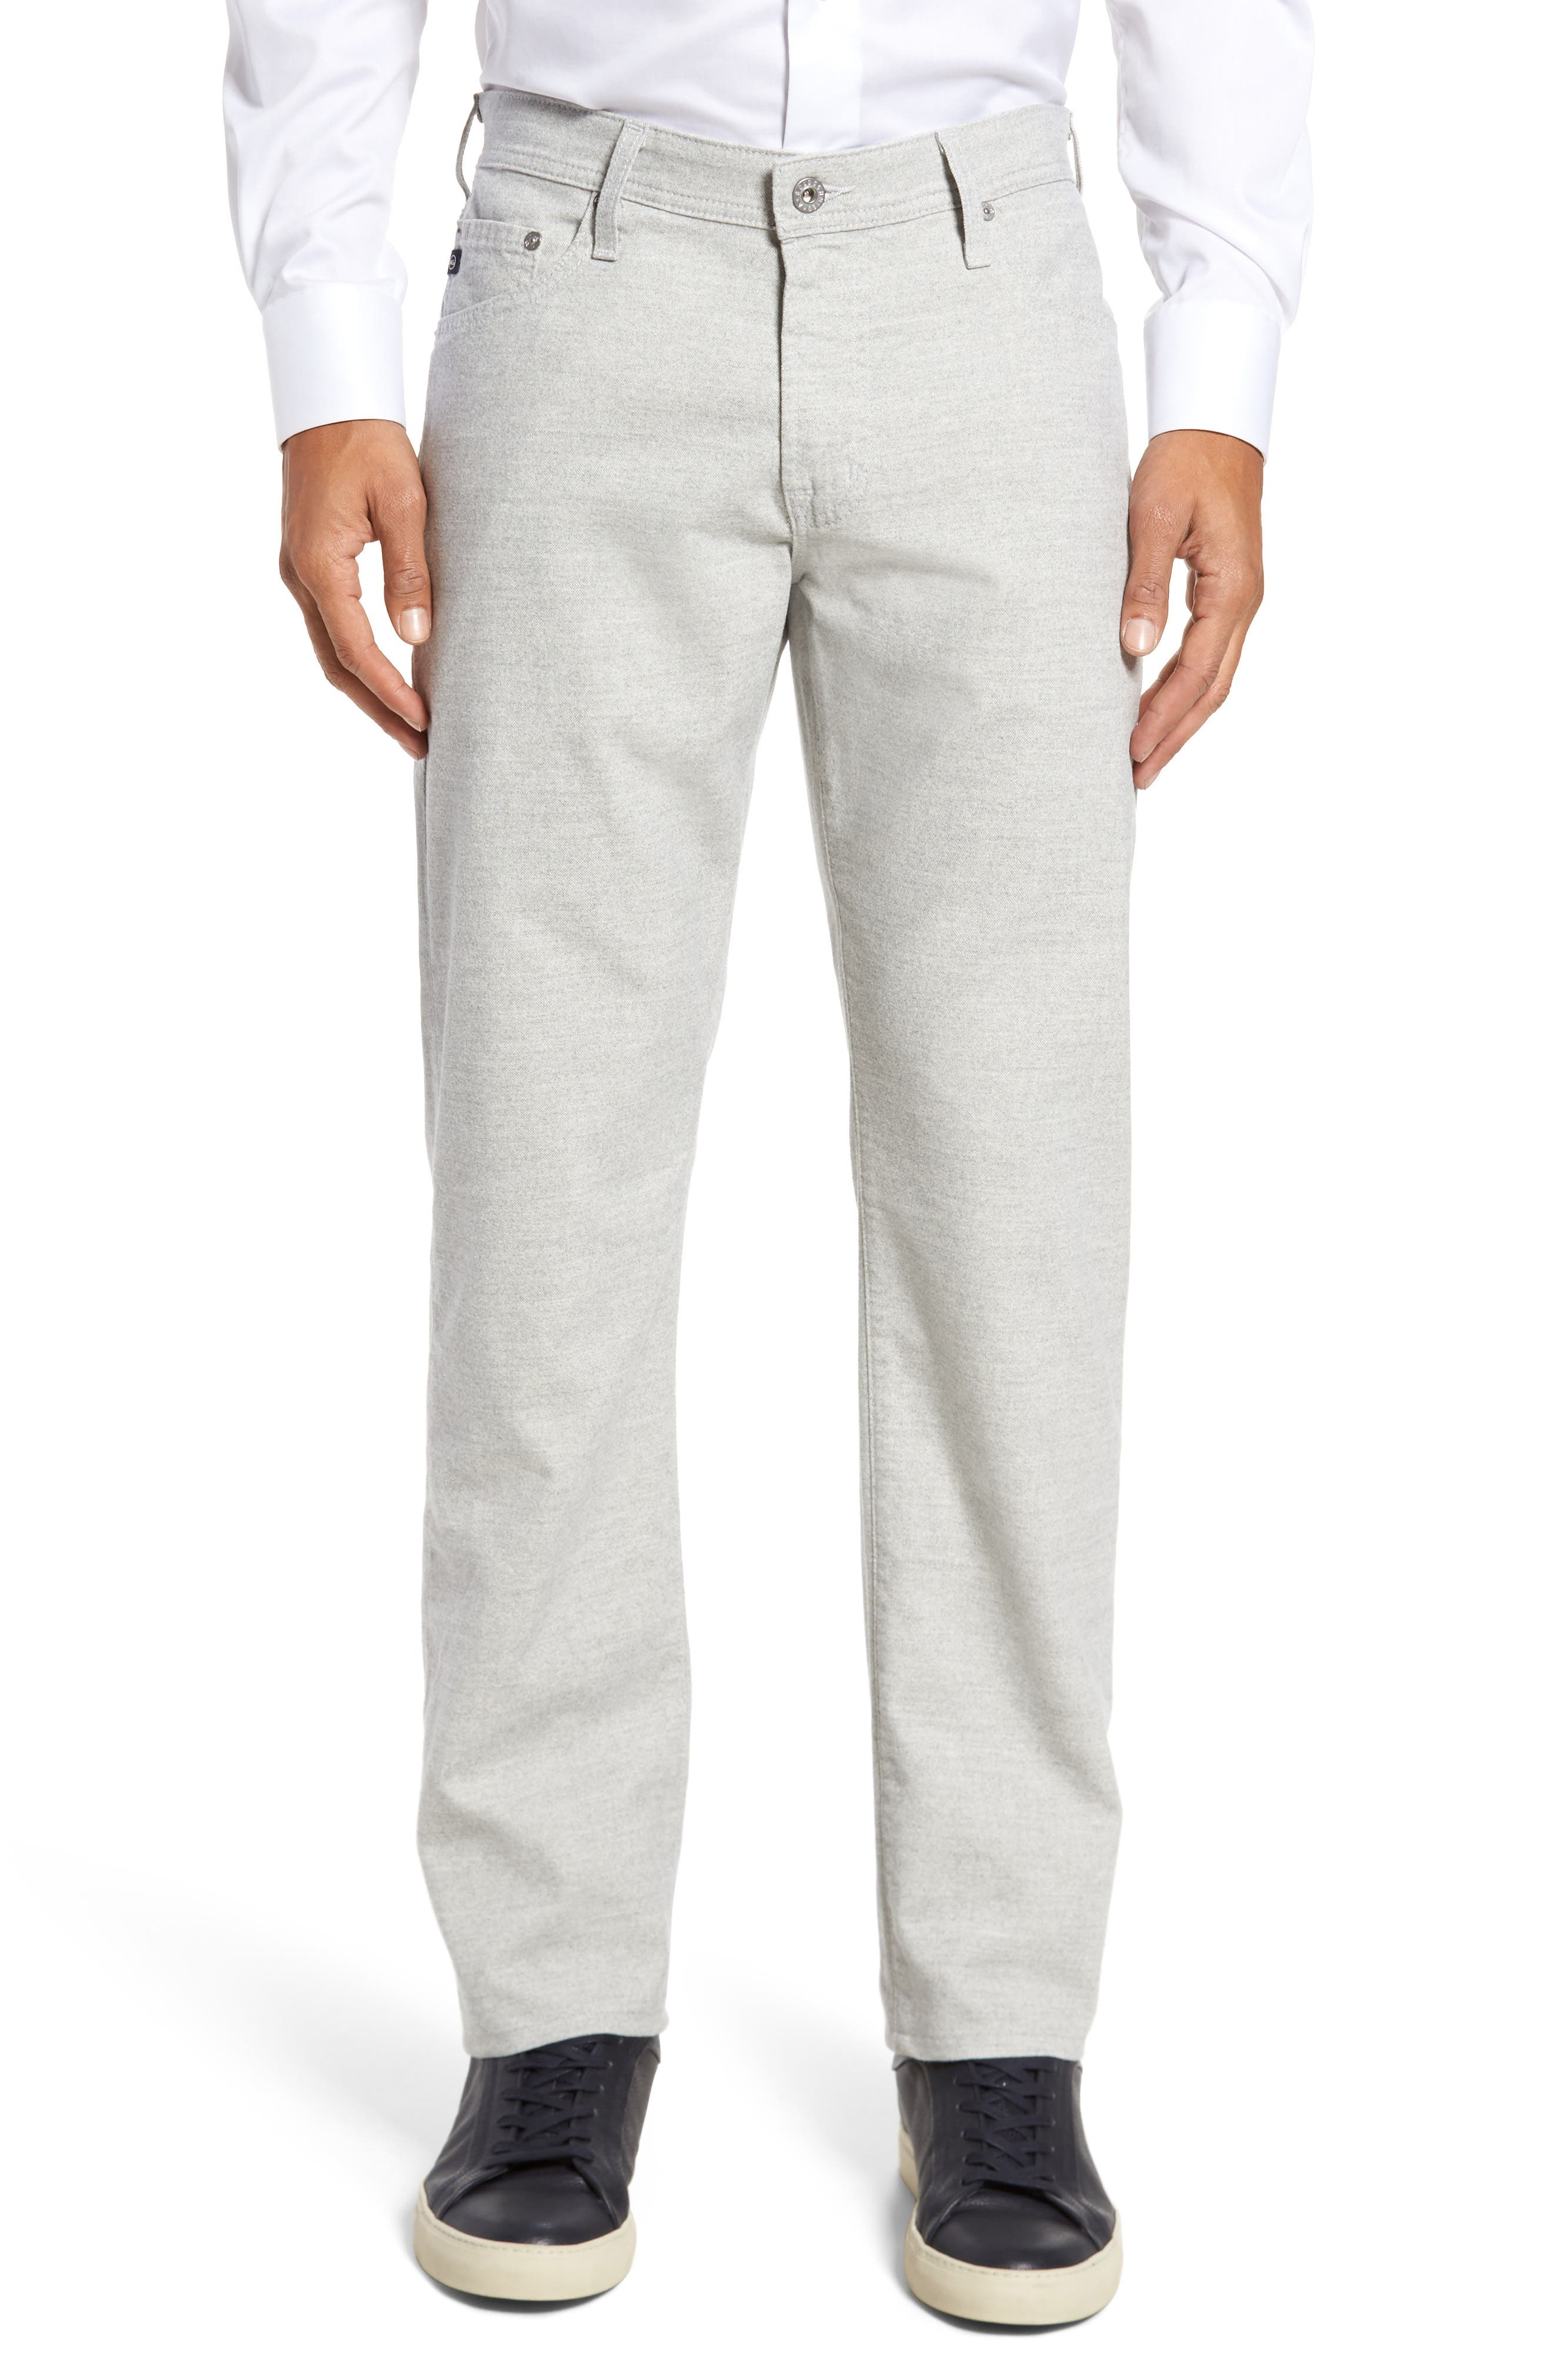 Graduate Tailored Five-Pocket Straight Leg Pants,                             Main thumbnail 1, color,                             020